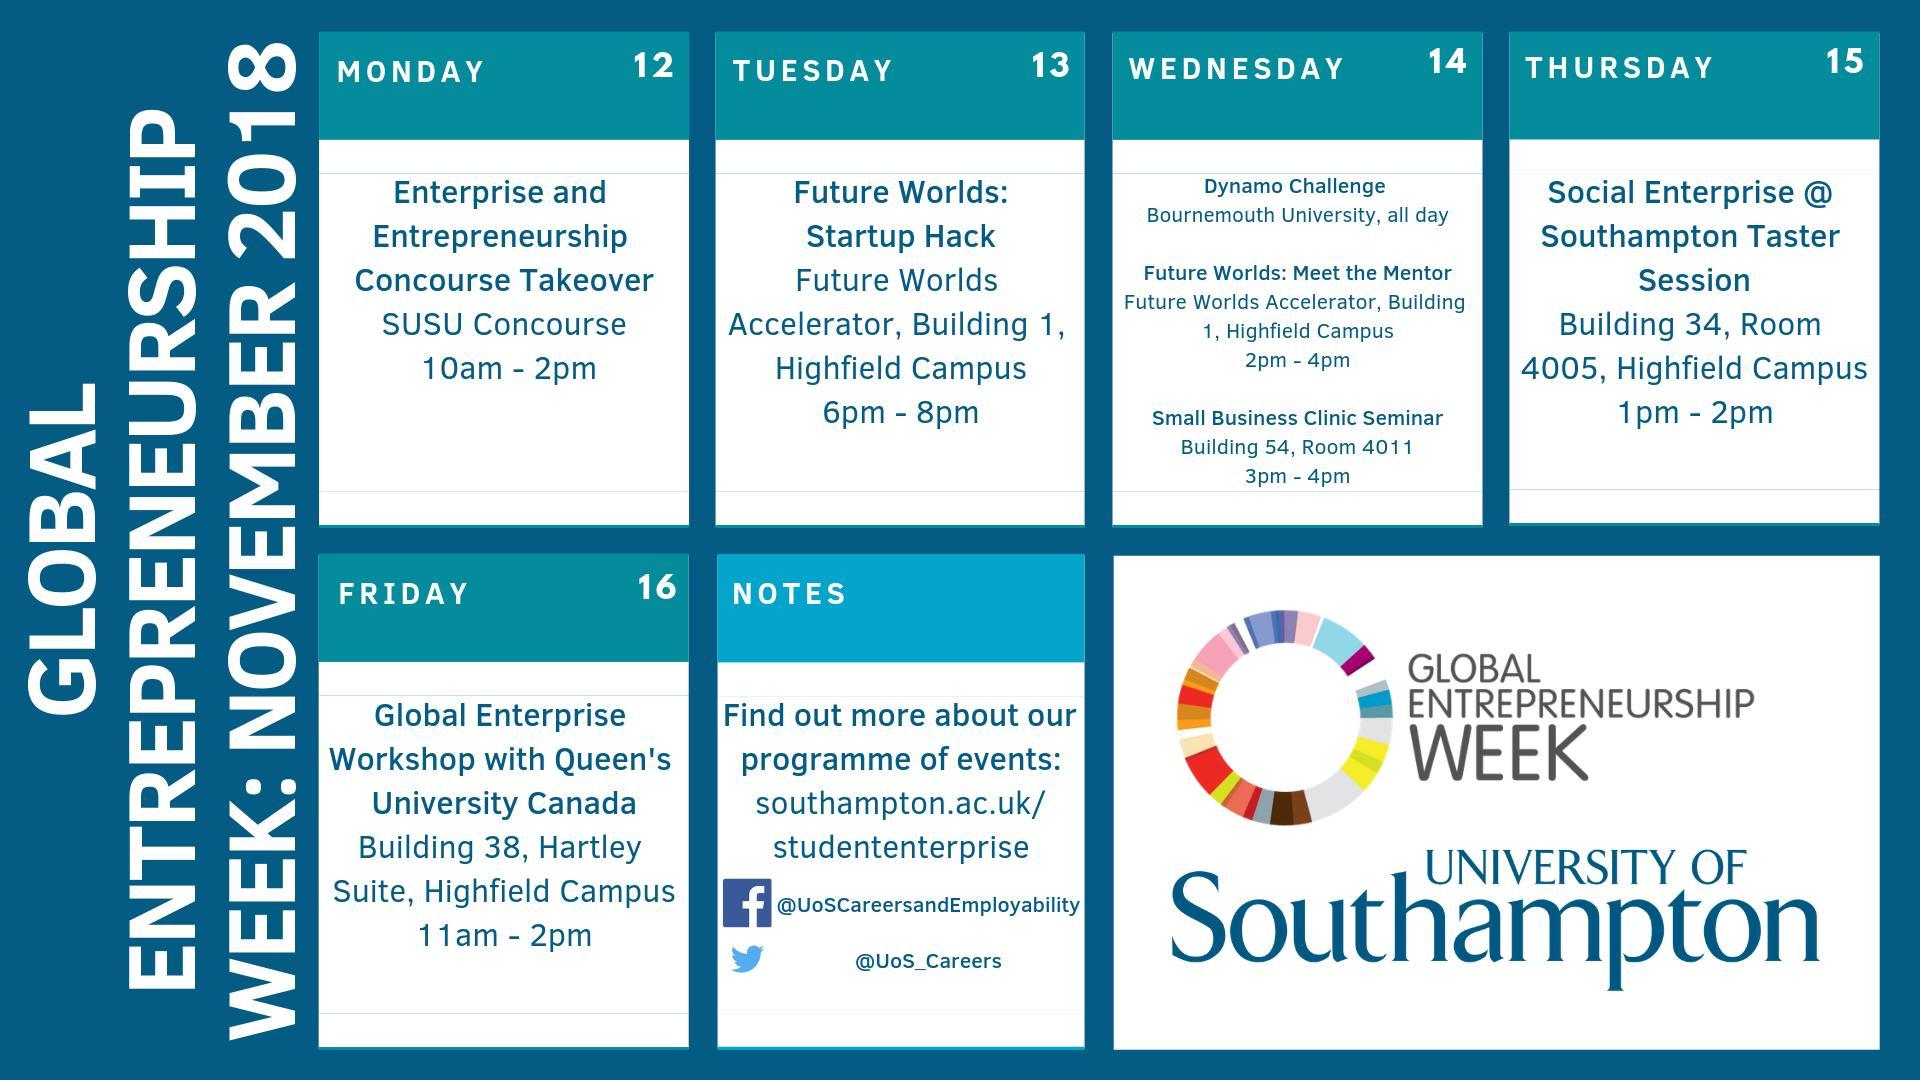 Global Entrepreneurship Week 2018 | Careers and Employability